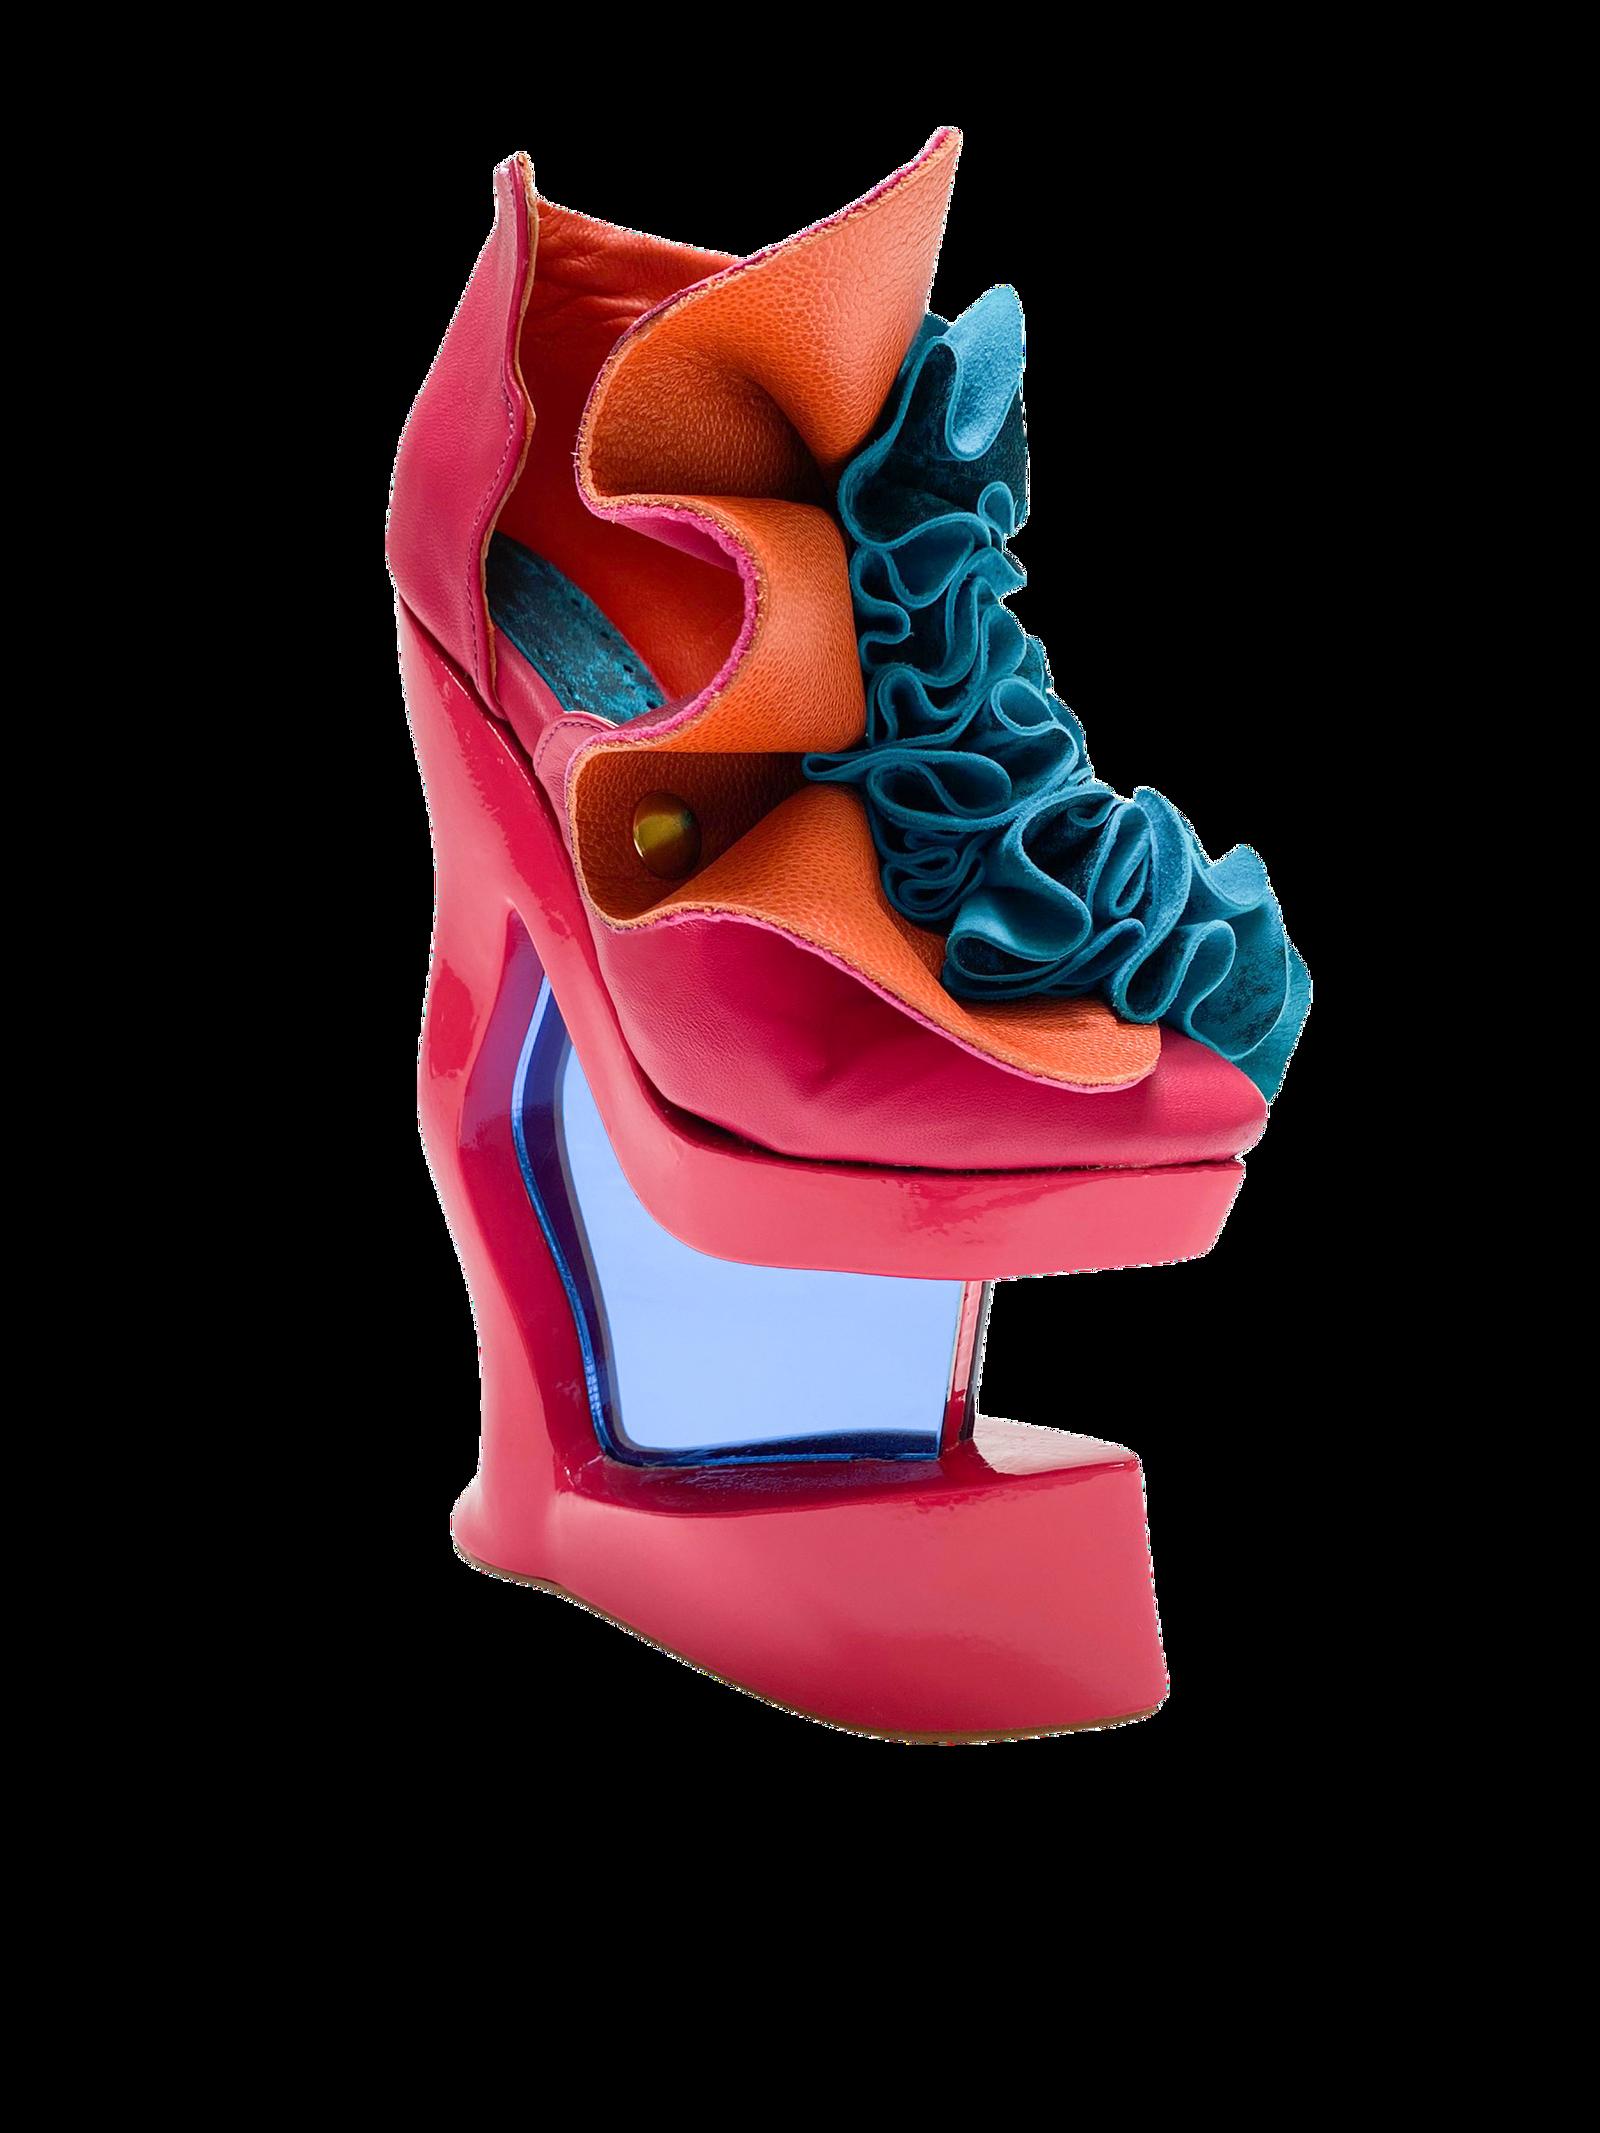 Footwear Shoes Pump 3d print